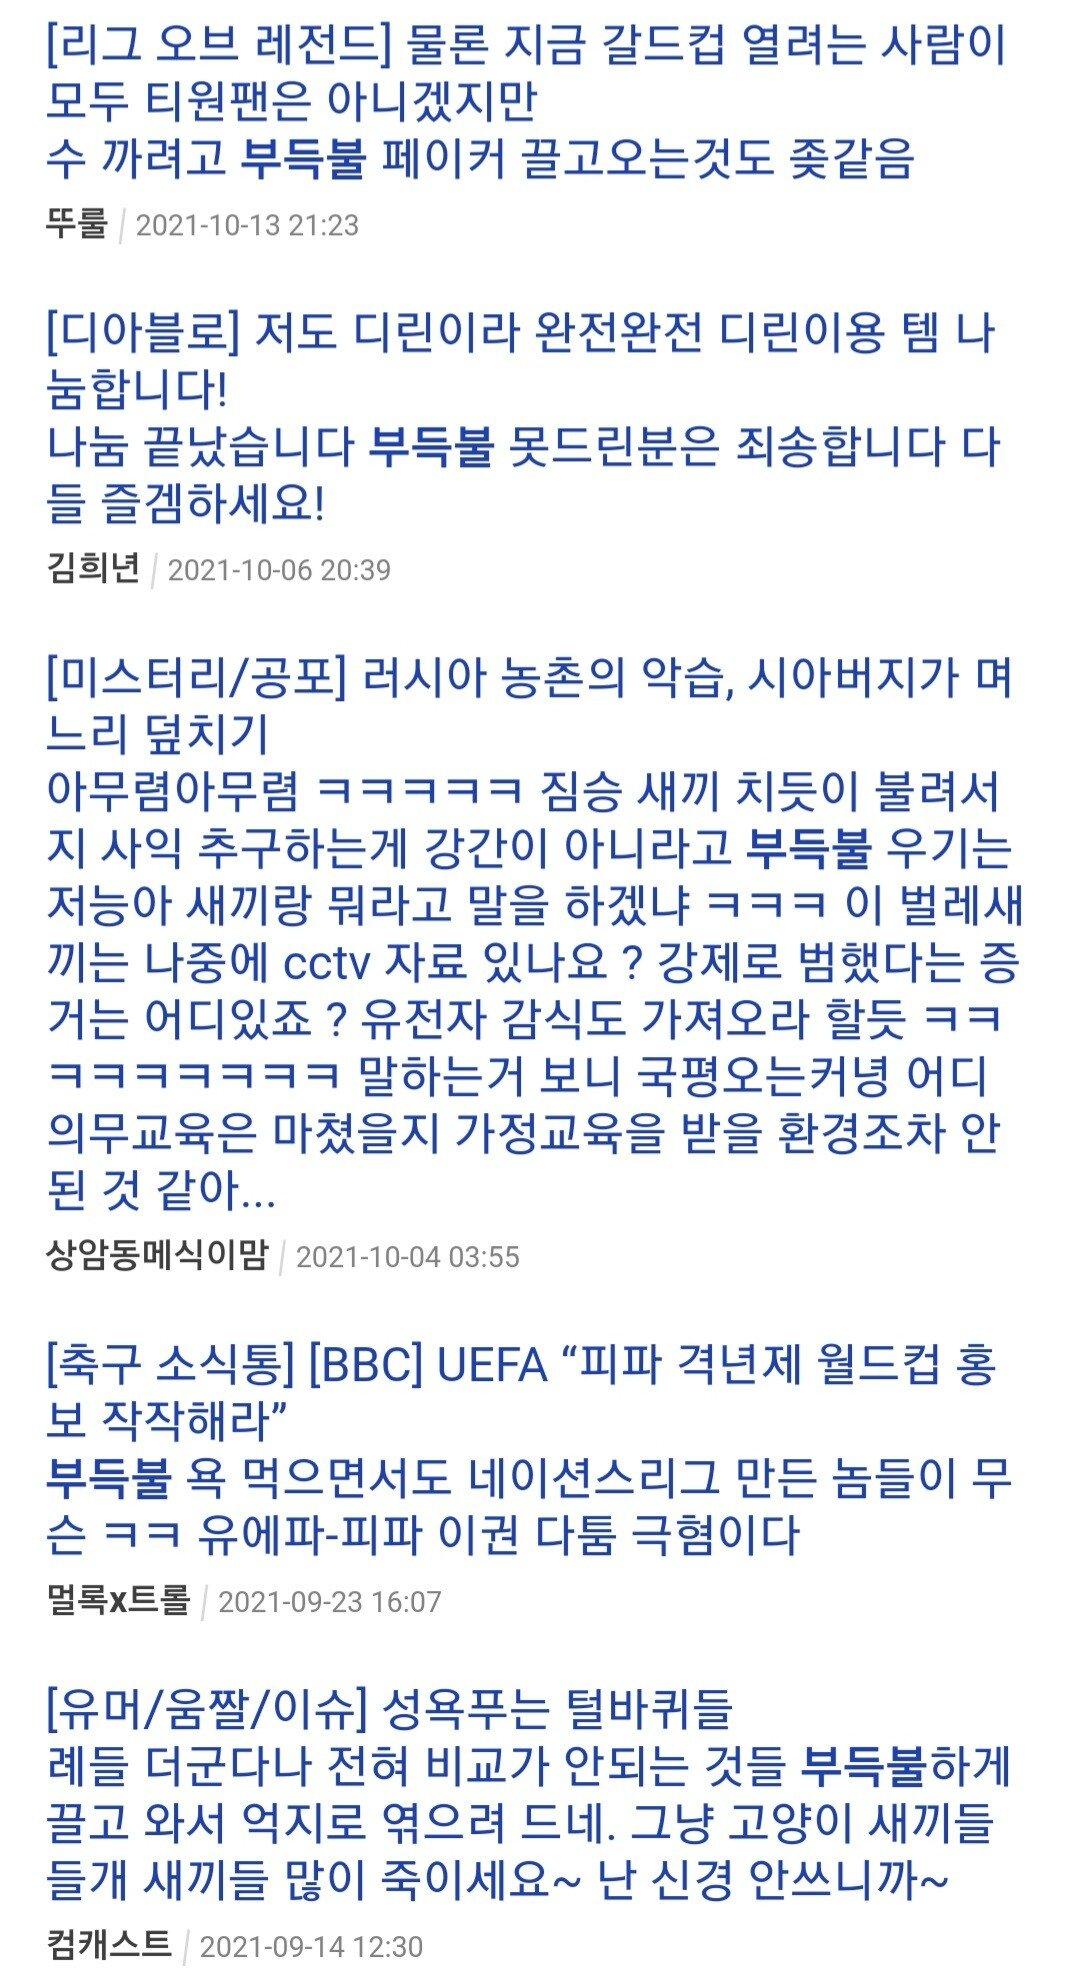 Screenshot_20211014-085932_Samsung Internet.jpg 요새 커뮤니티 키배에서 자주 보이는 단어